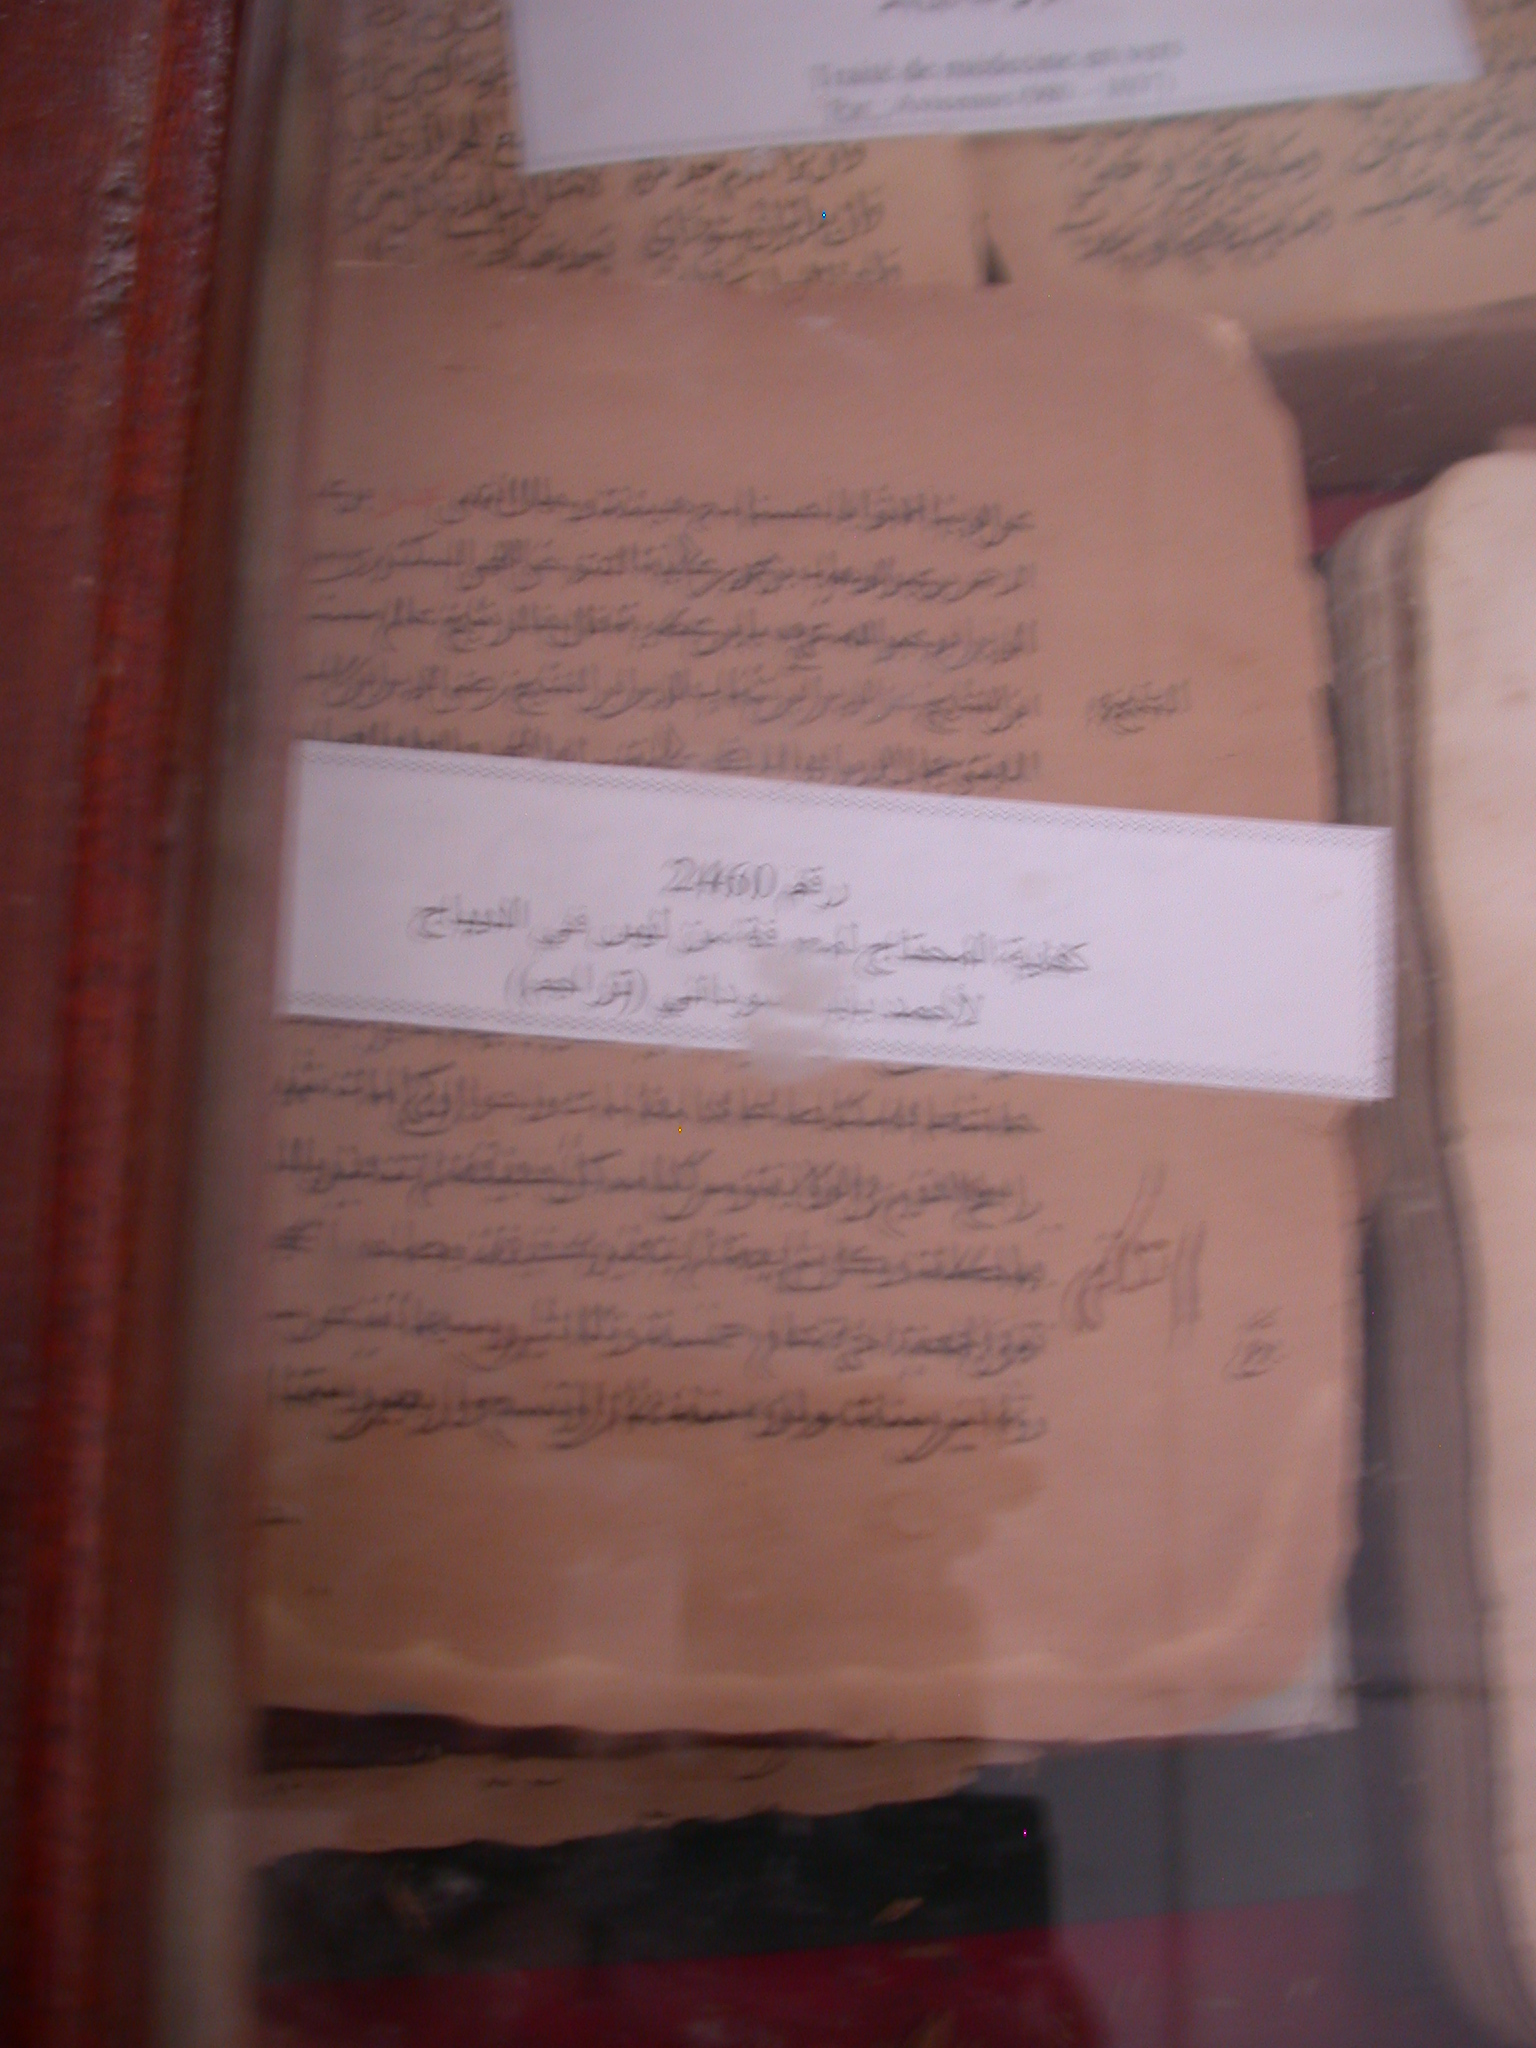 Blurry Photo of Manuscript, Ahmed Baba Institute, Institut des Hautes Etudes et de Recherches Islamiques, Timbuktu, Mali